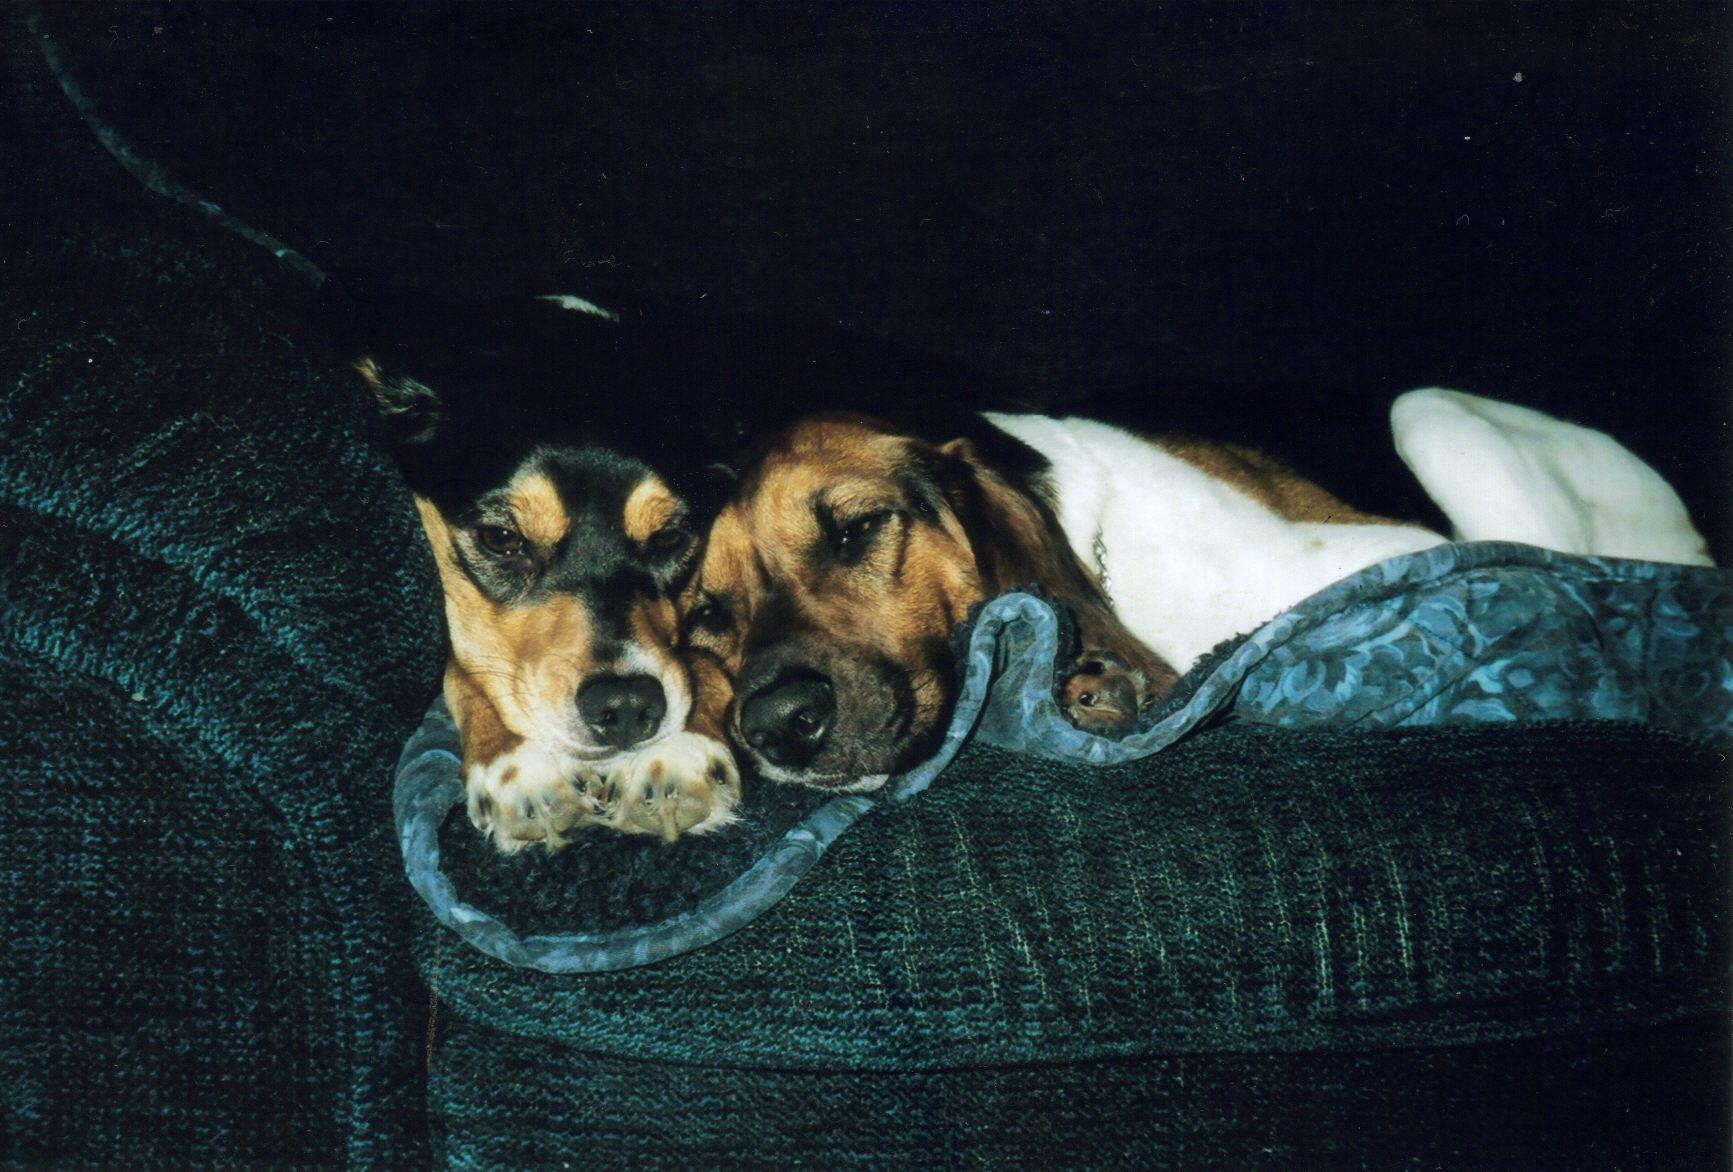 Bailey and Jake - January 2005